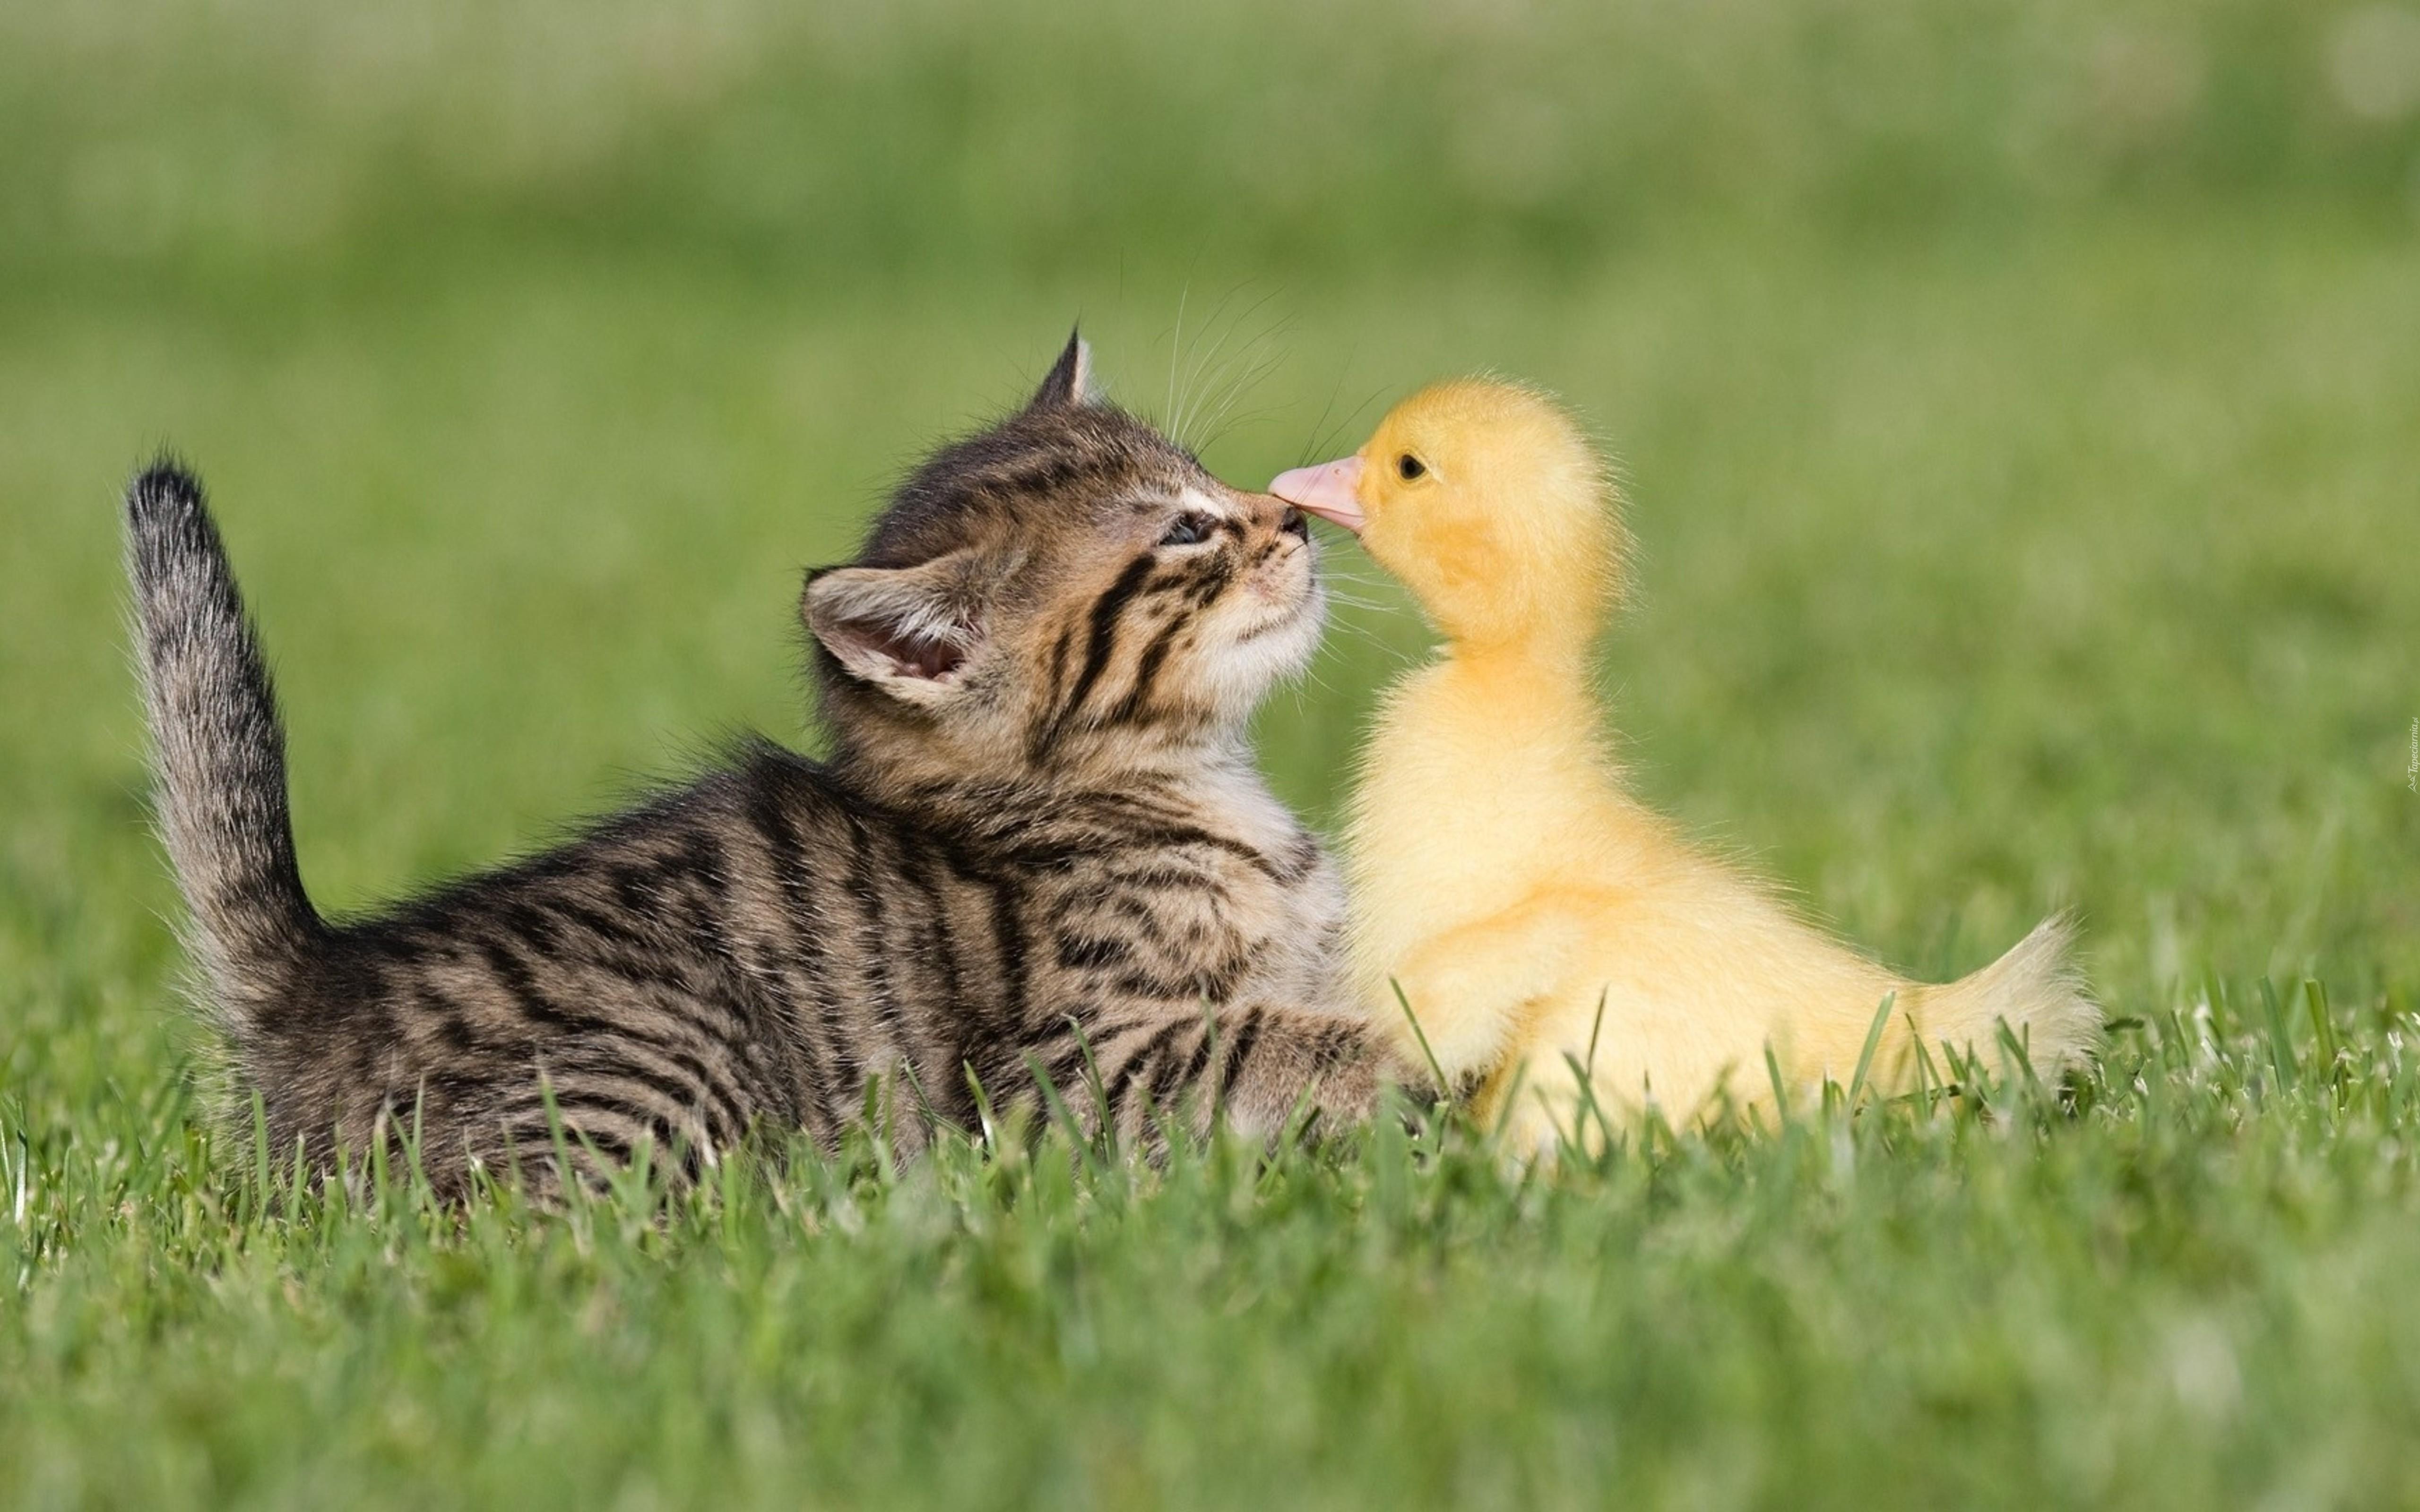 Kaczka, Kot, Trawa